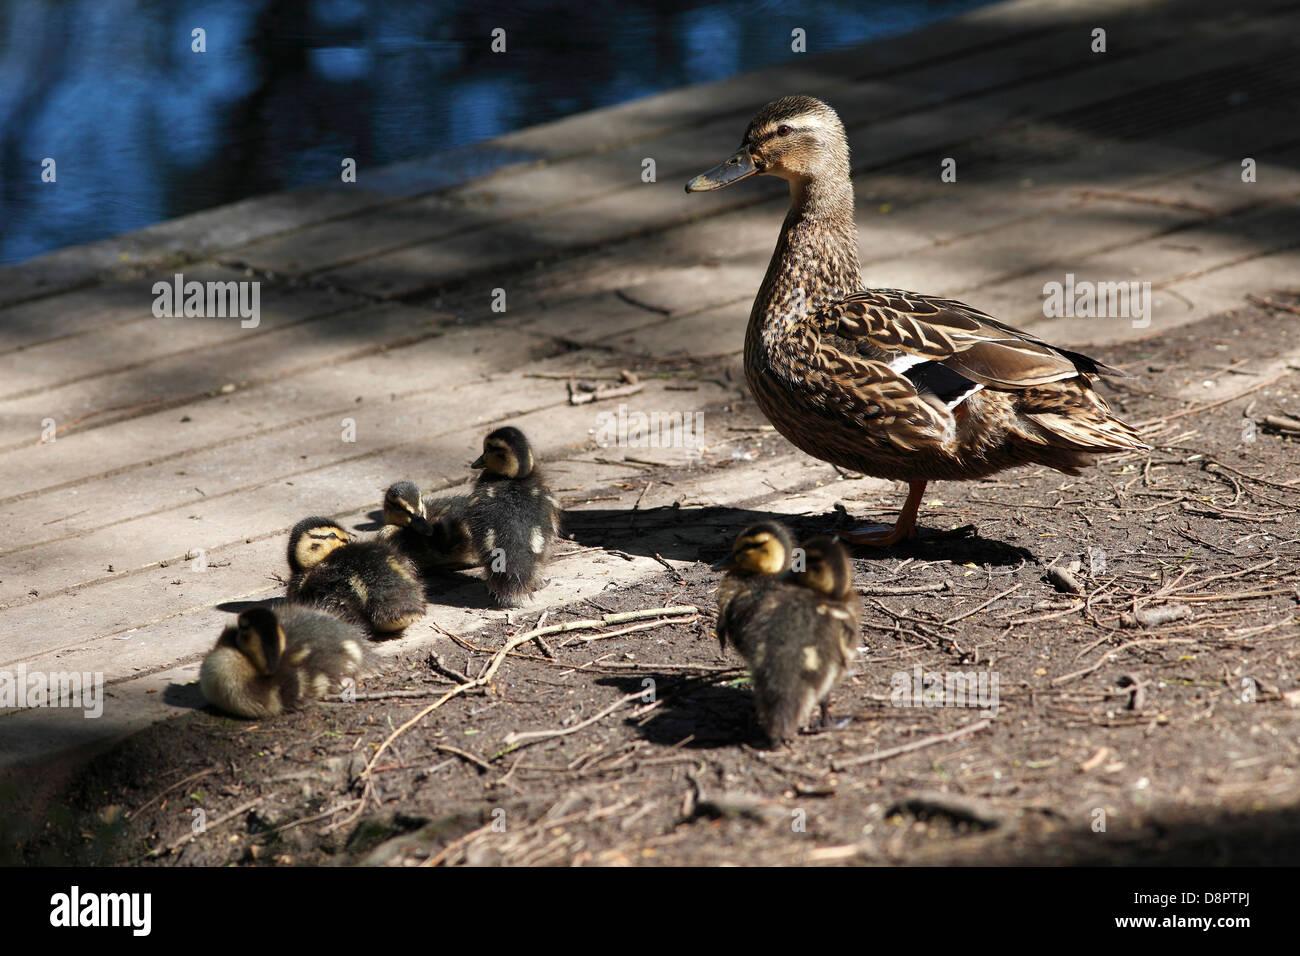 Hen Mallard duck with chicks resting in sun Milton country park Cambridgeshire Stock Photo